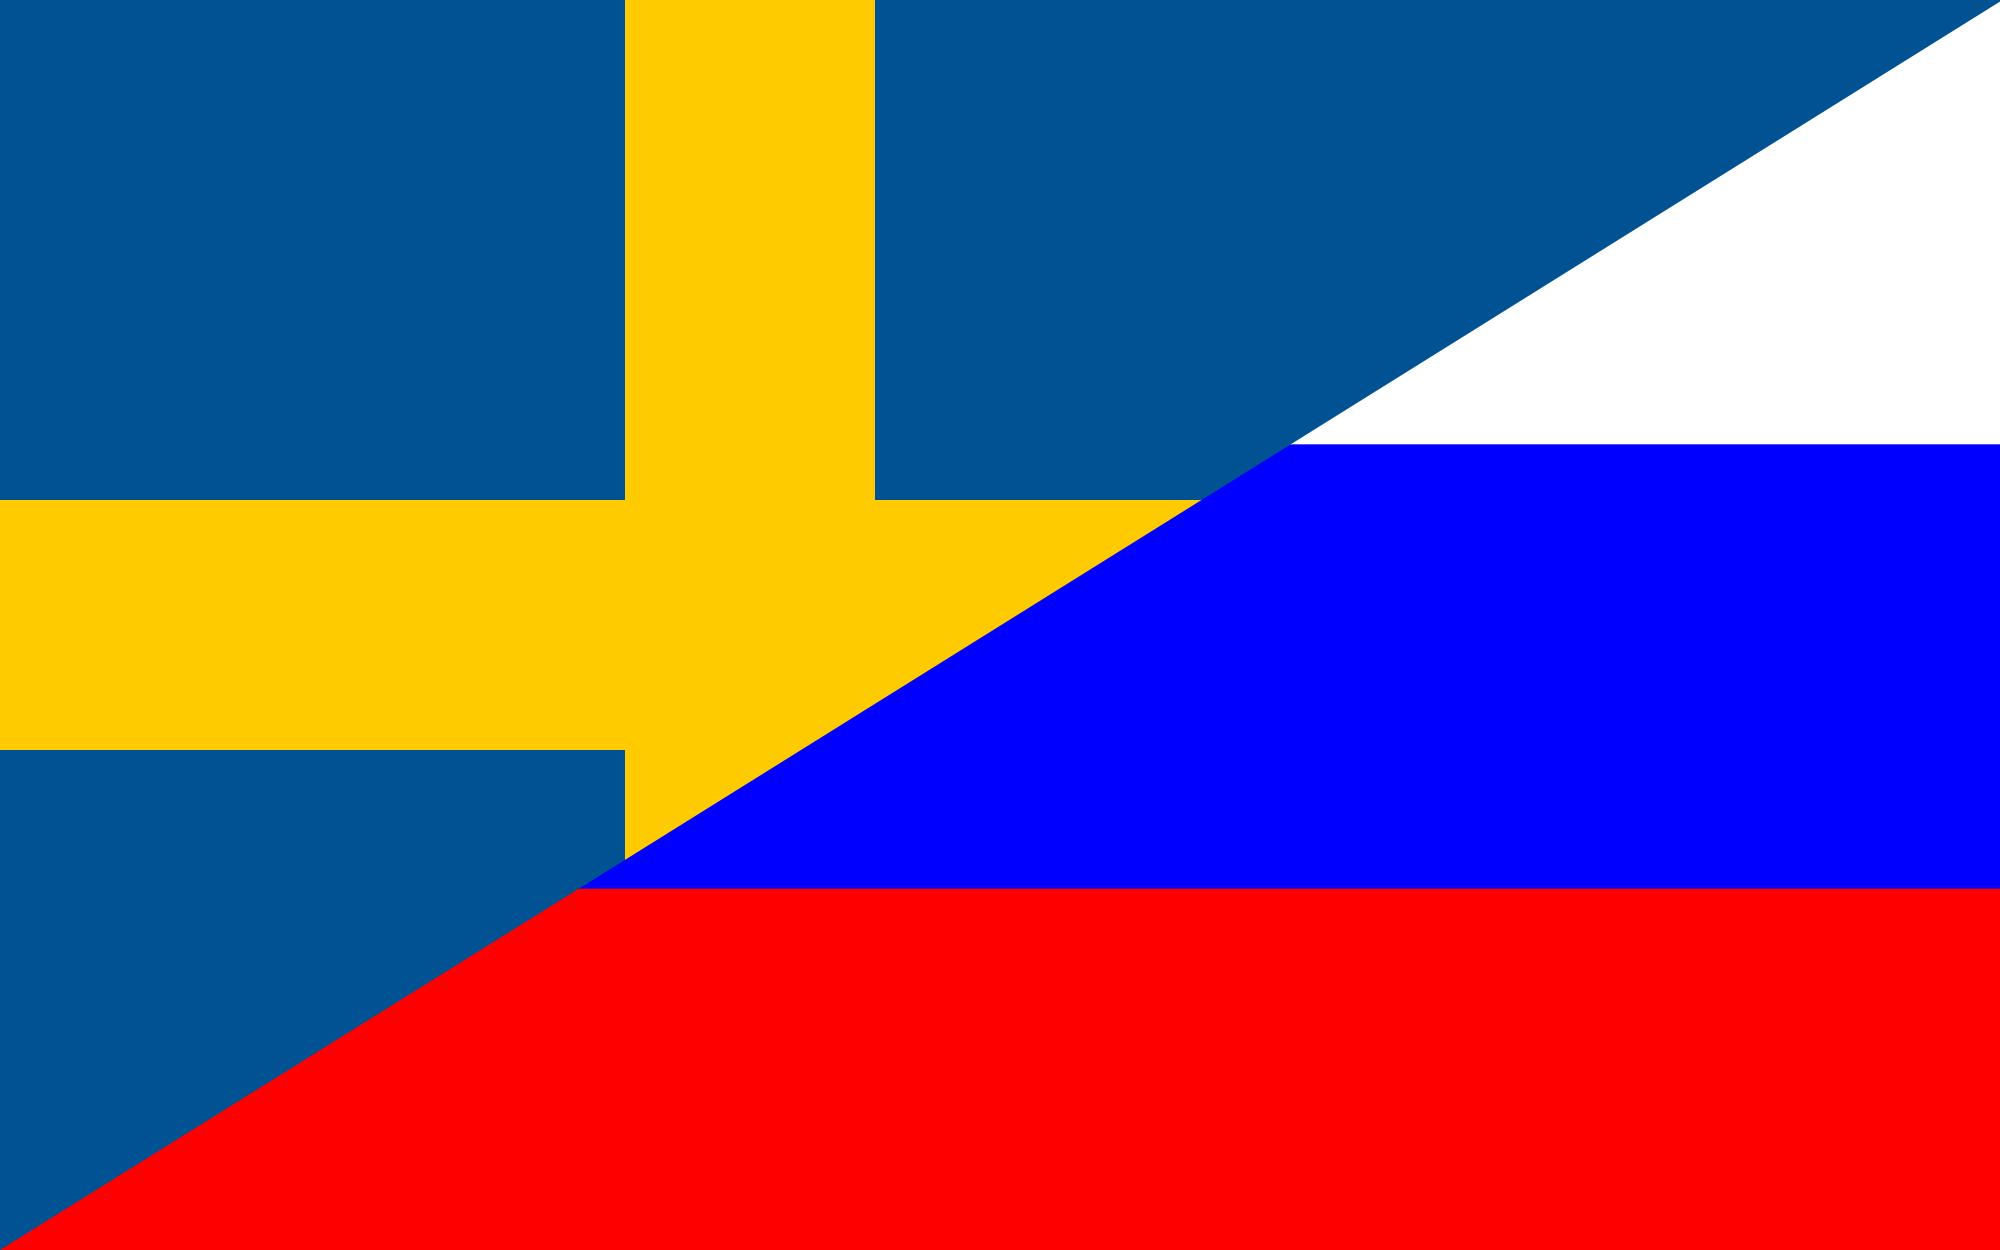 The Swedish-Russian Relations between 1648-1815 - GEOPOLITICA.info